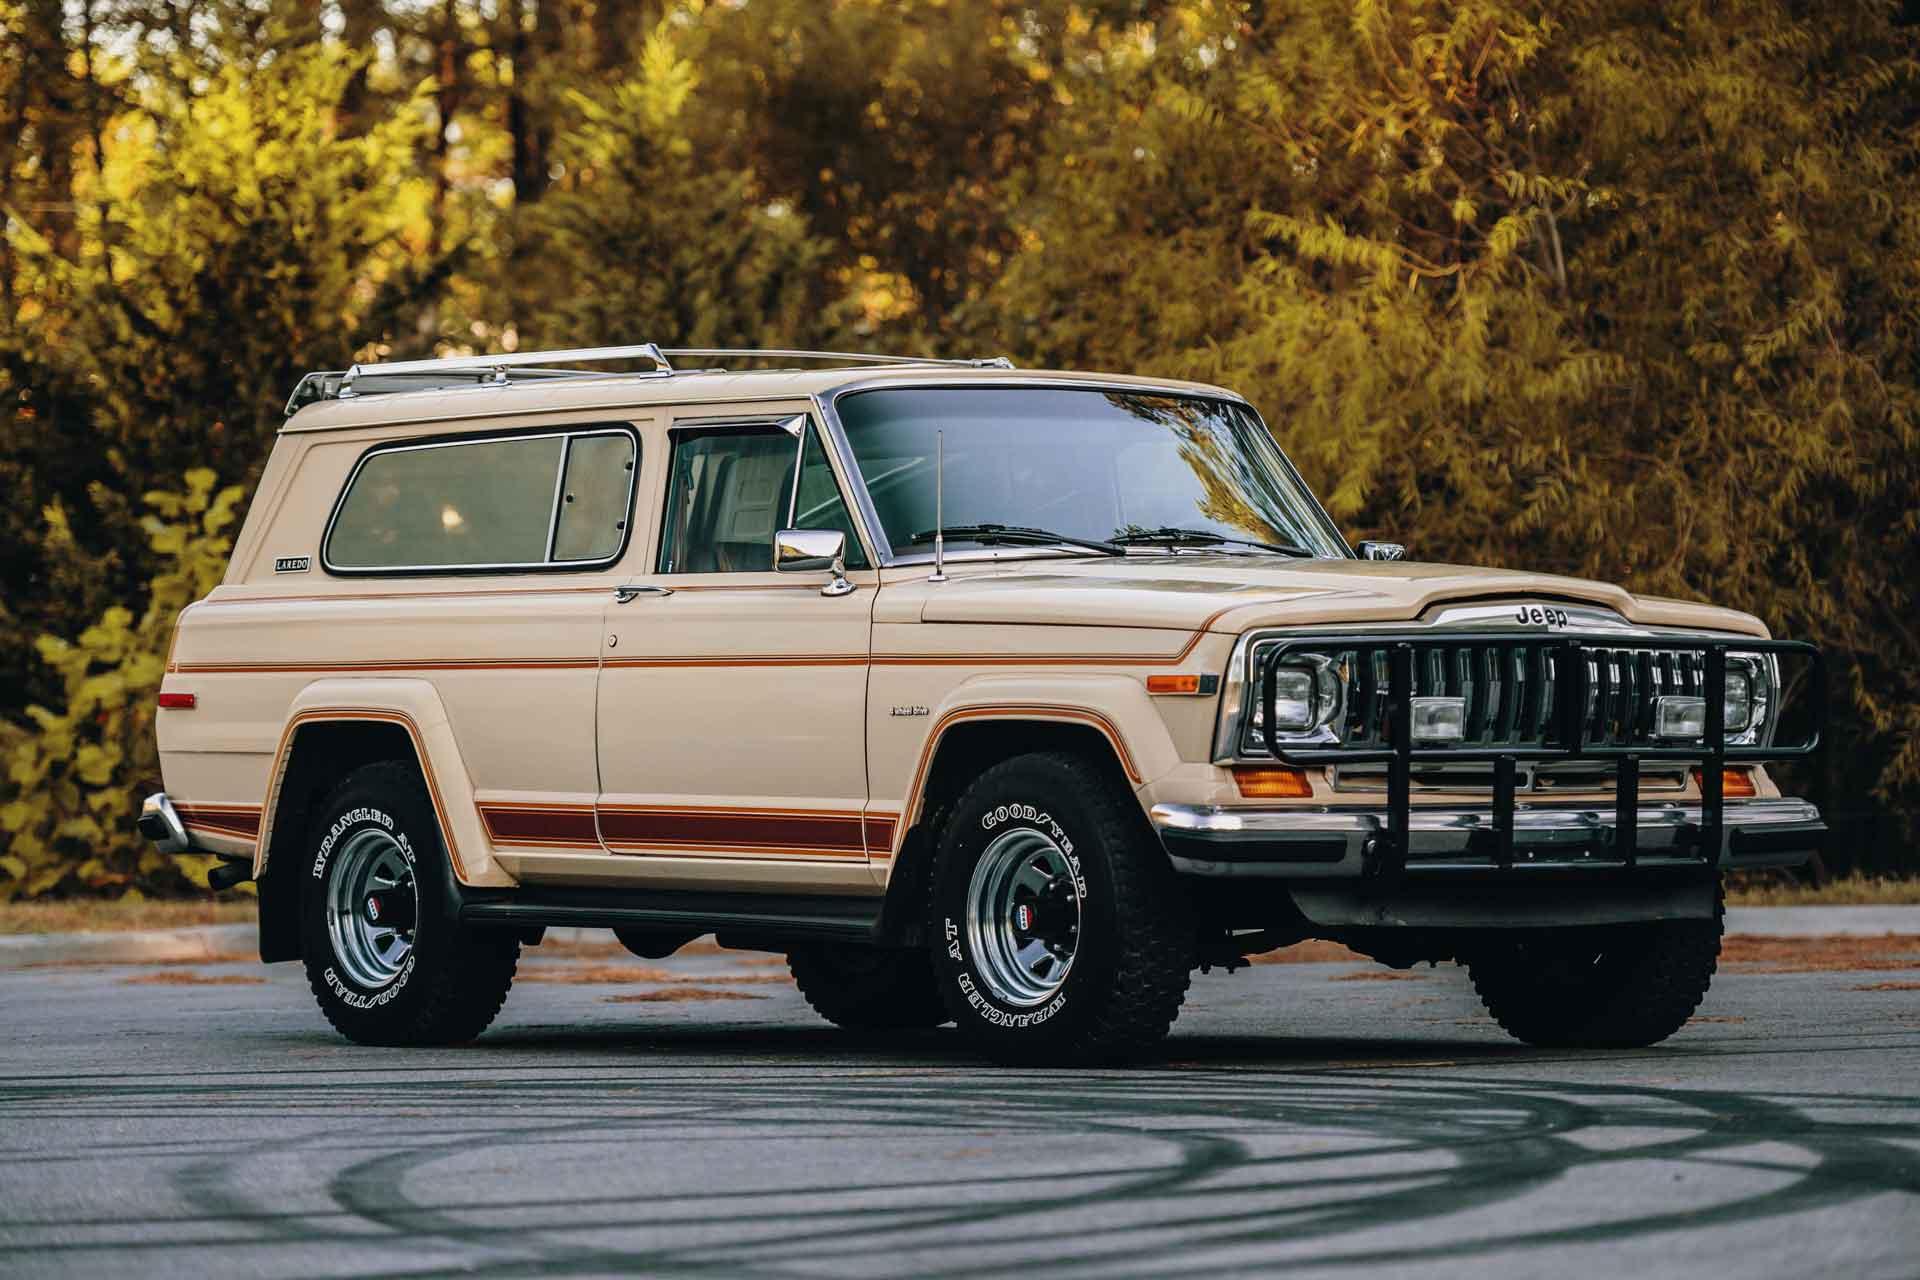 1983 Jeep Cherokee Laredo SUV